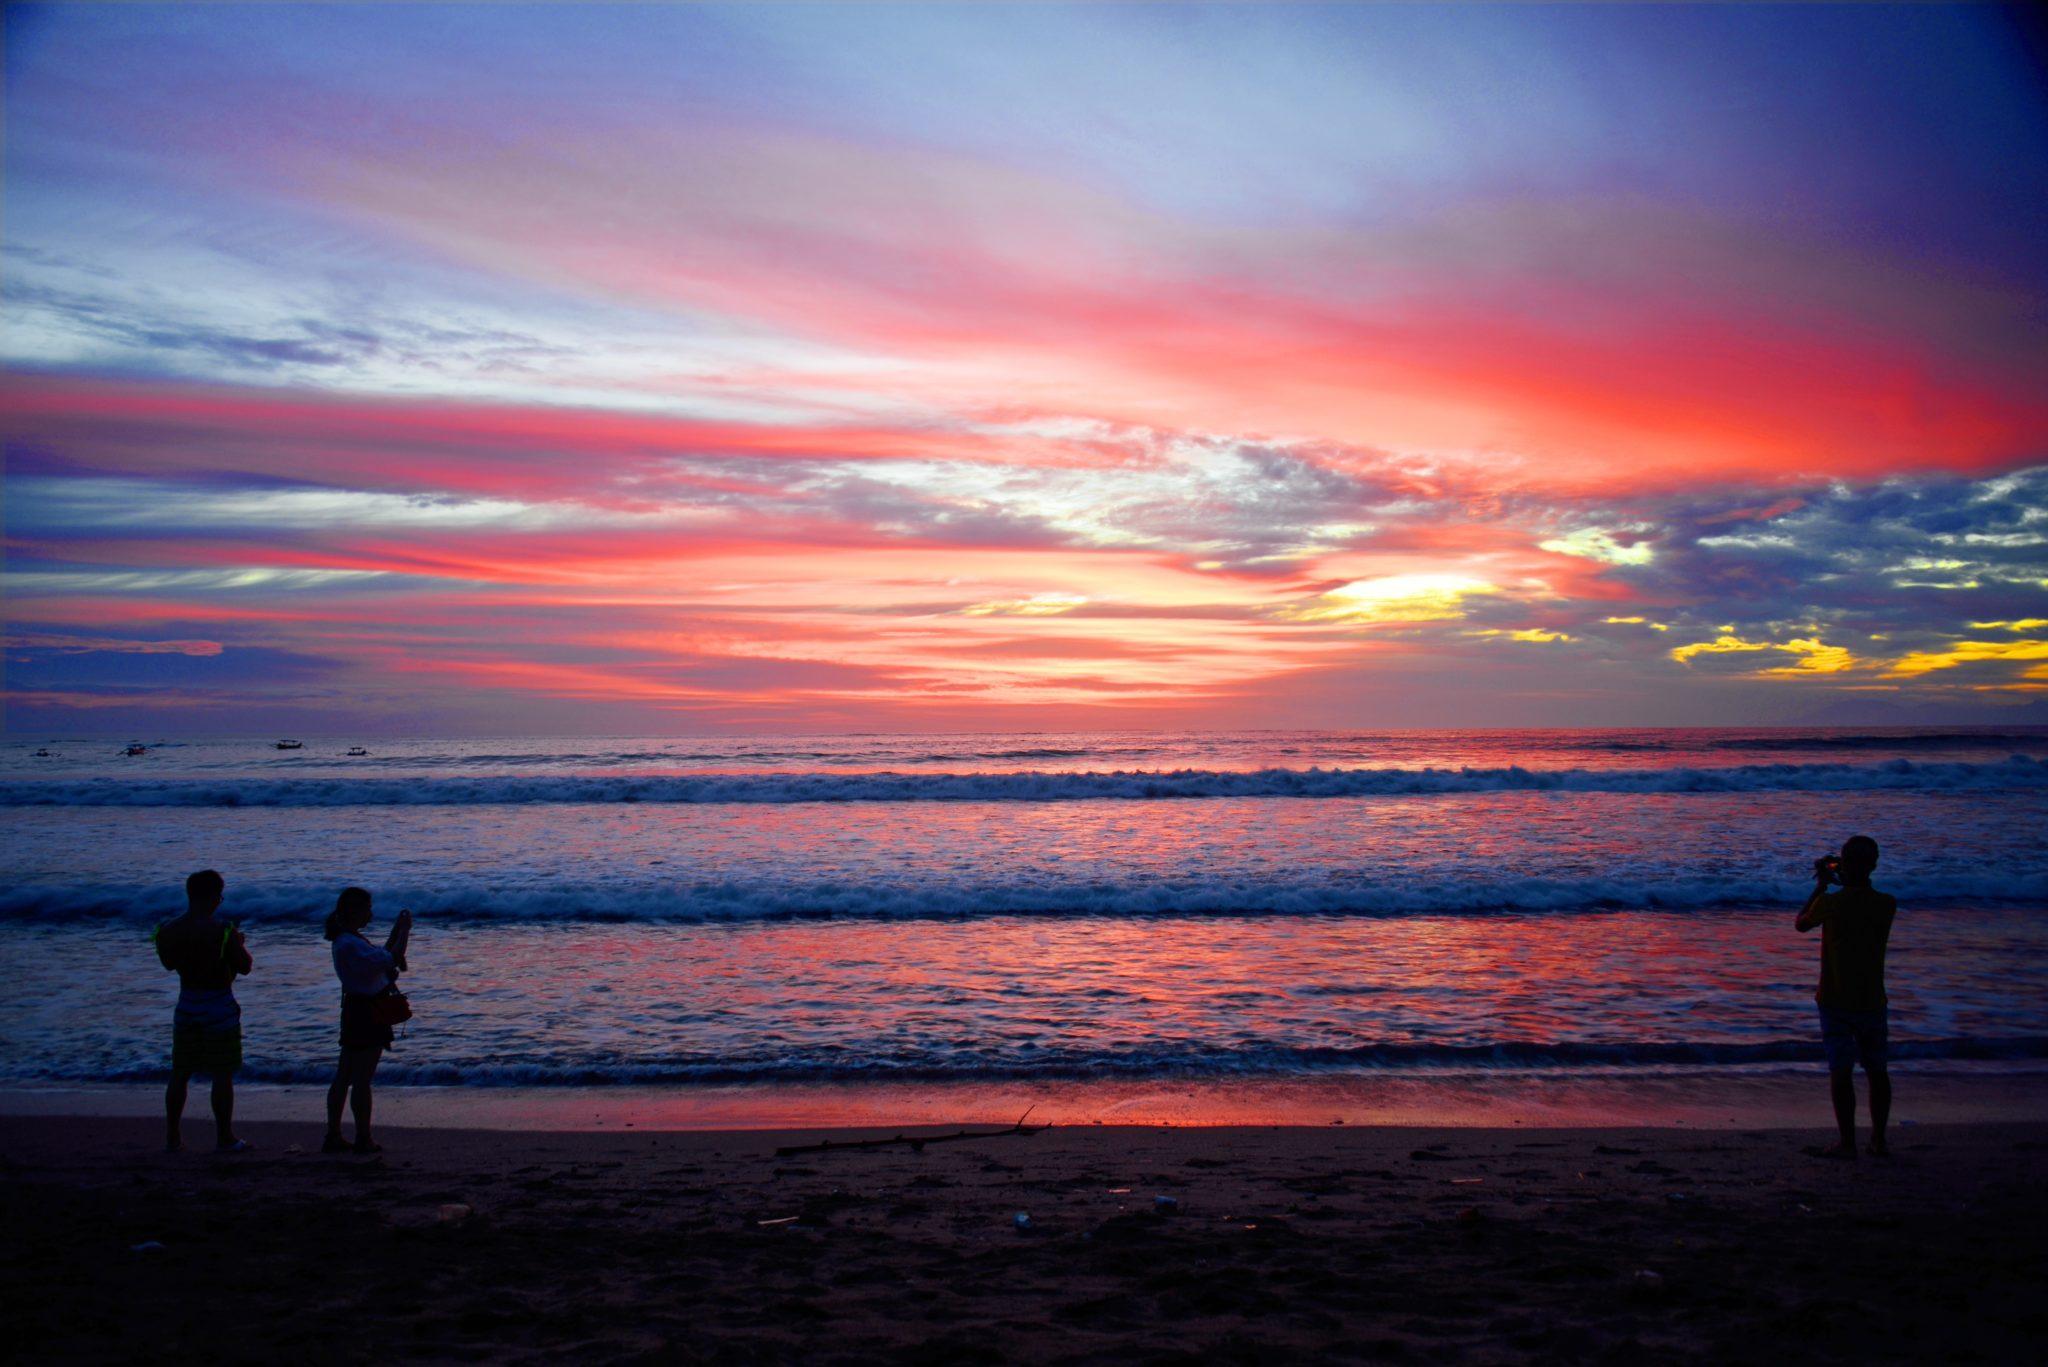 flights to Australia - Top layover destinations Bali Sun set on beach